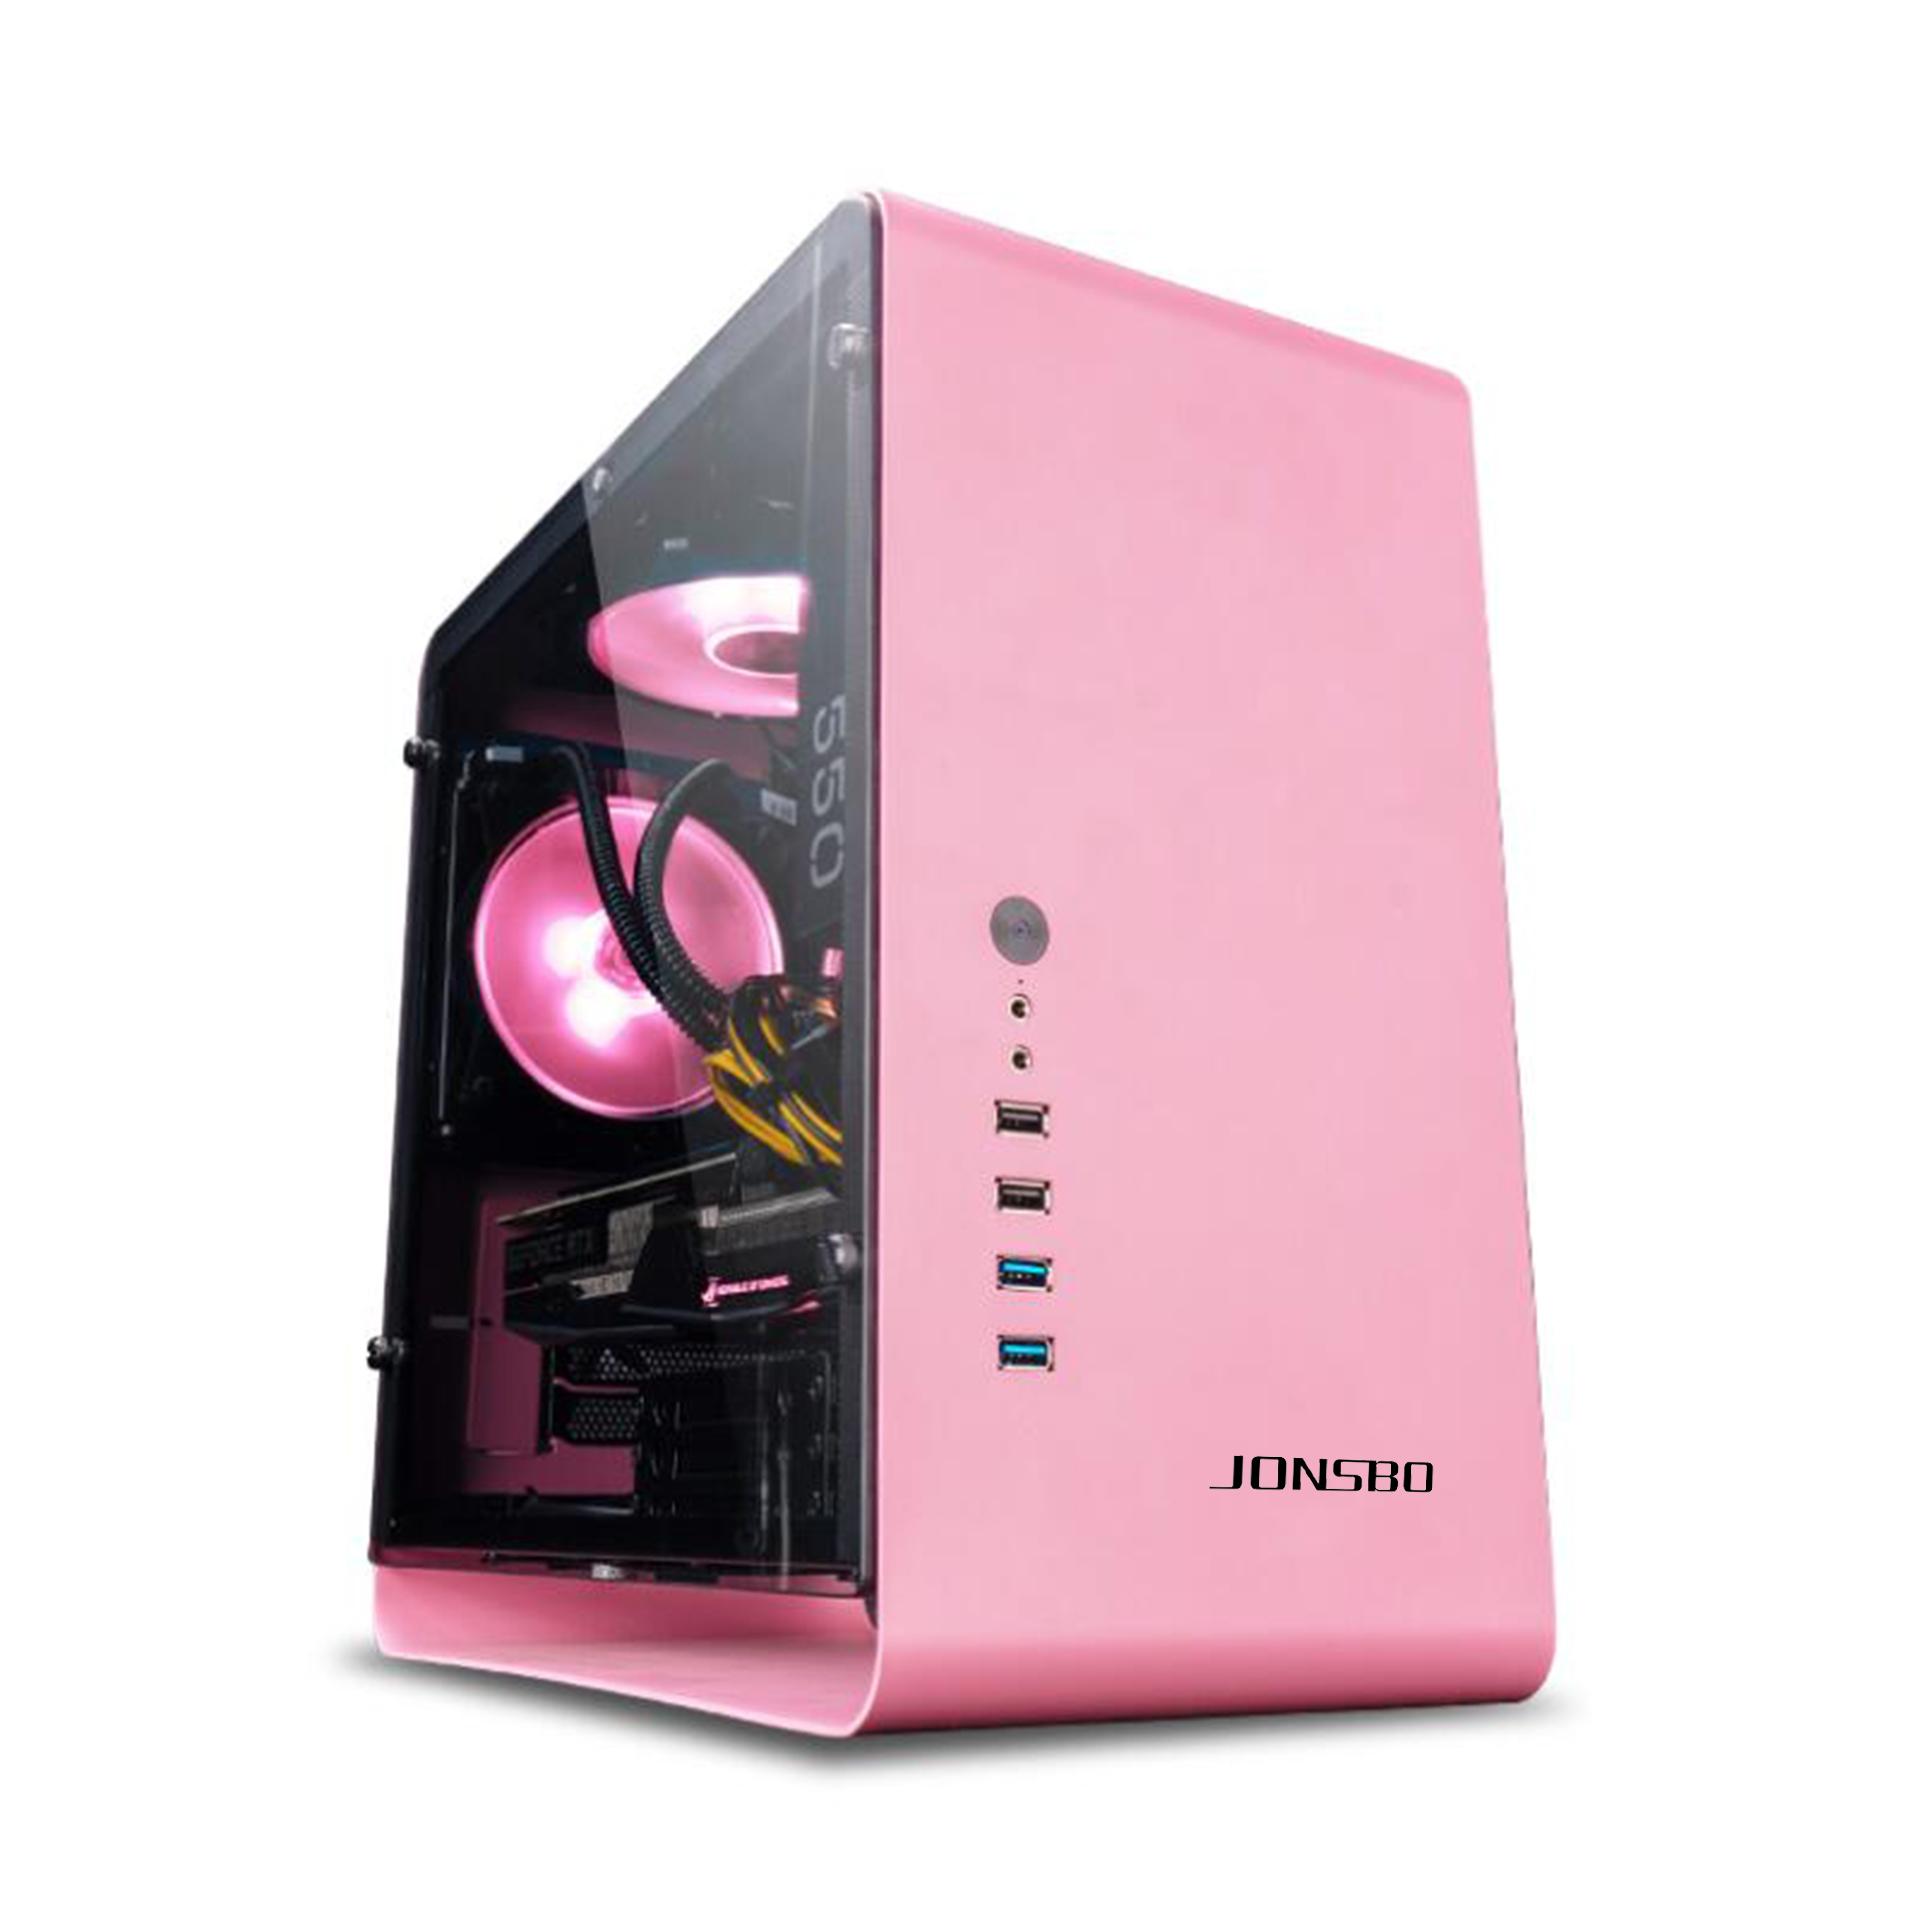 کامپیوتر دسکتاپ جونزبو مدلUMX3